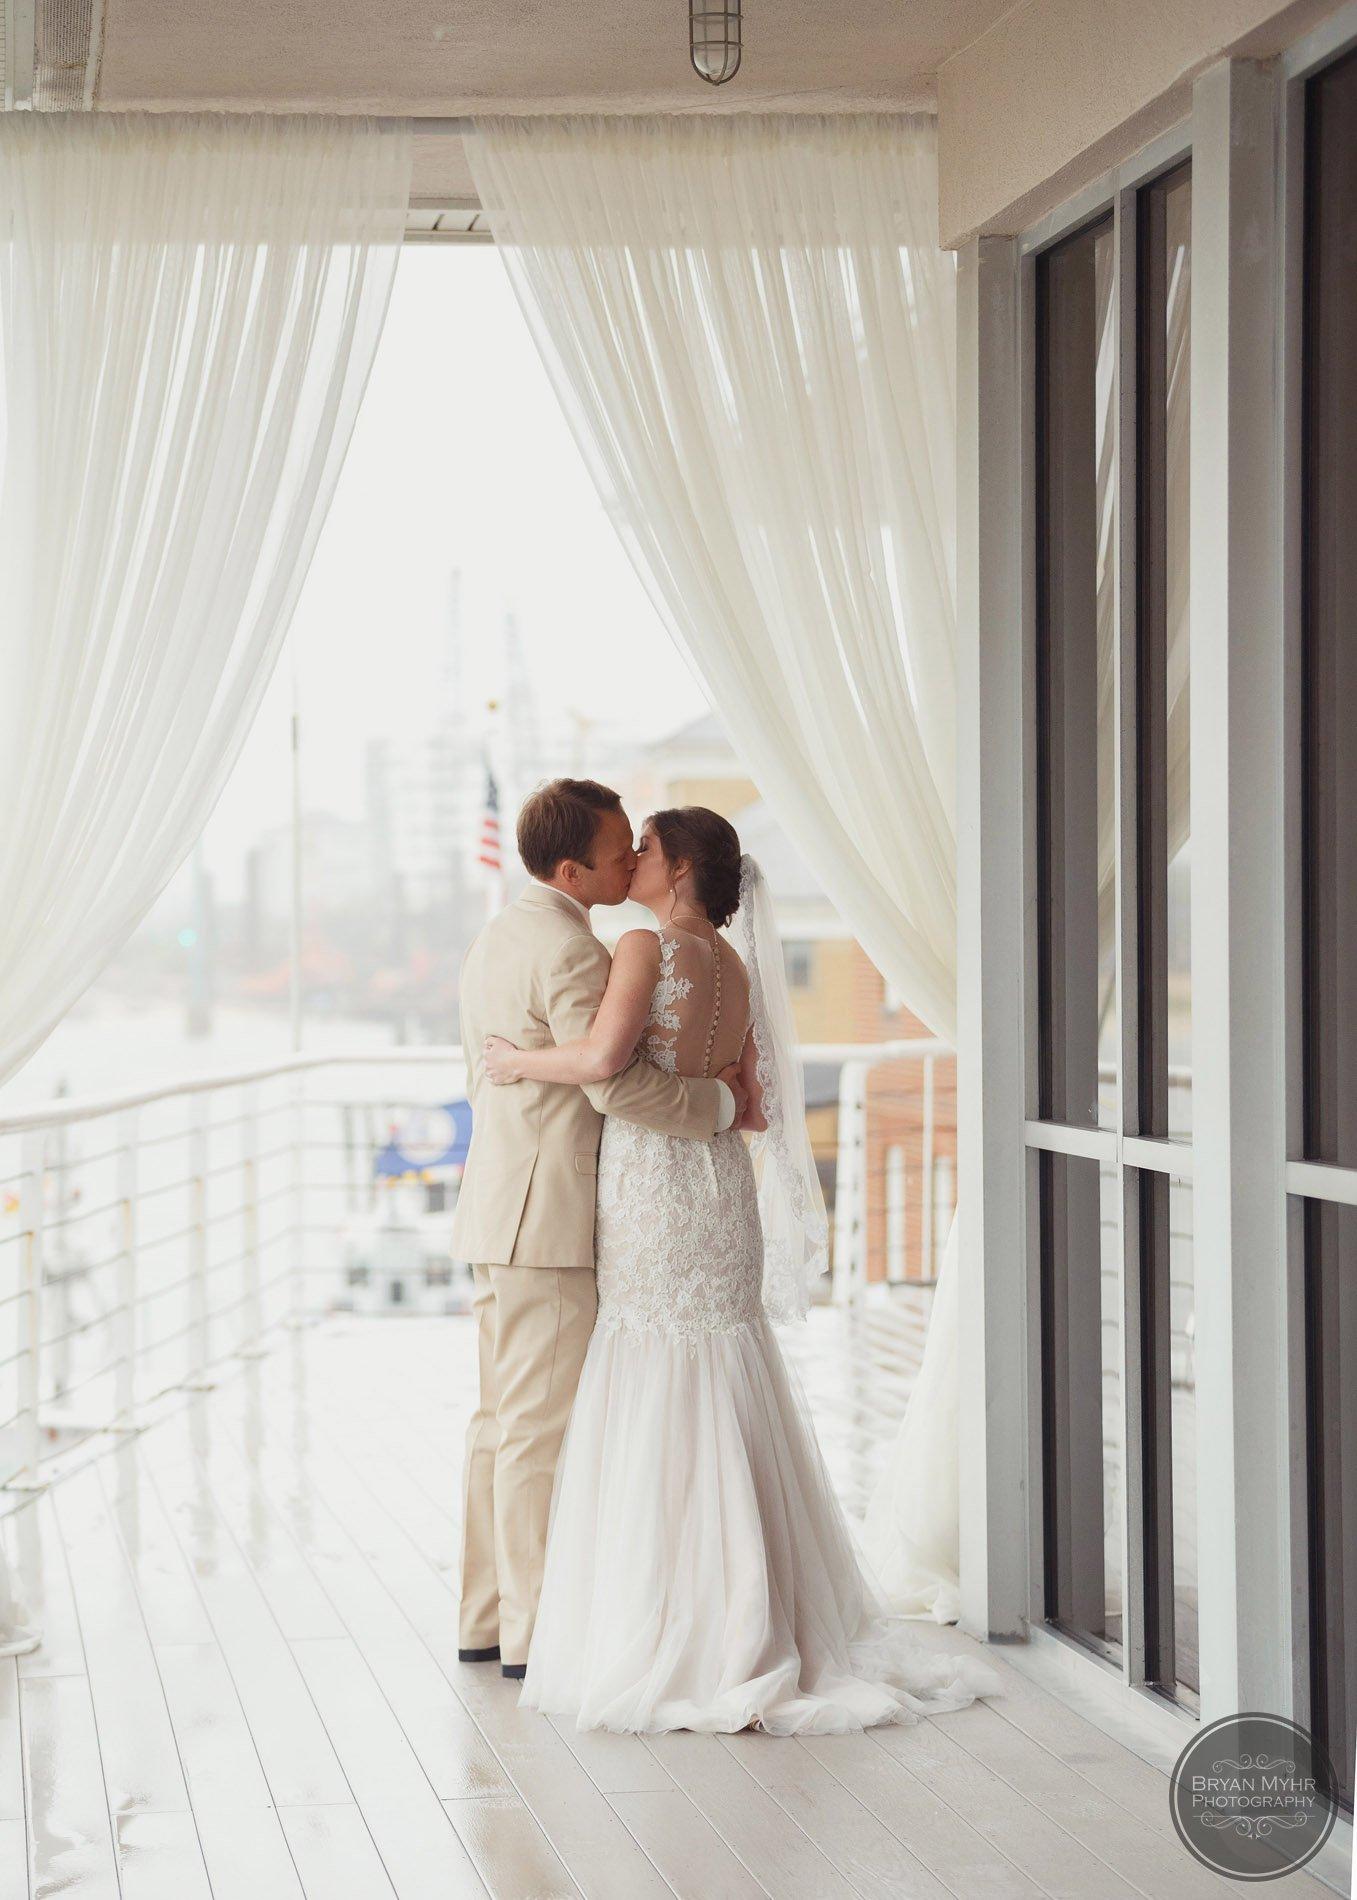 Best-Rainy-Wedding-Rainy-Weddings-Bryan-Myhr.jpg